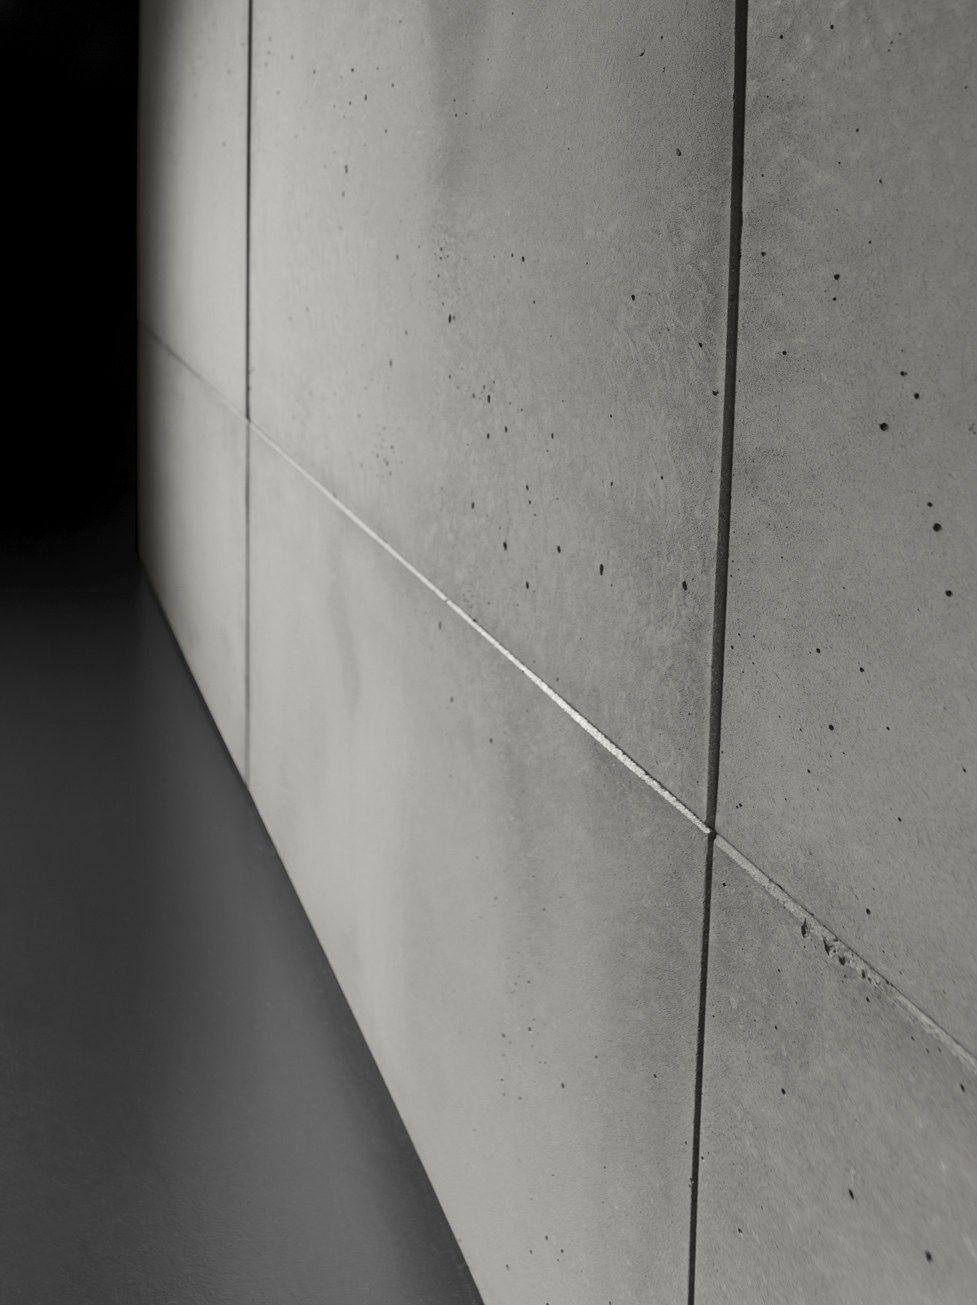 e1015v vertical wall epoxy coating primer to 8 mils no sag 12 colors